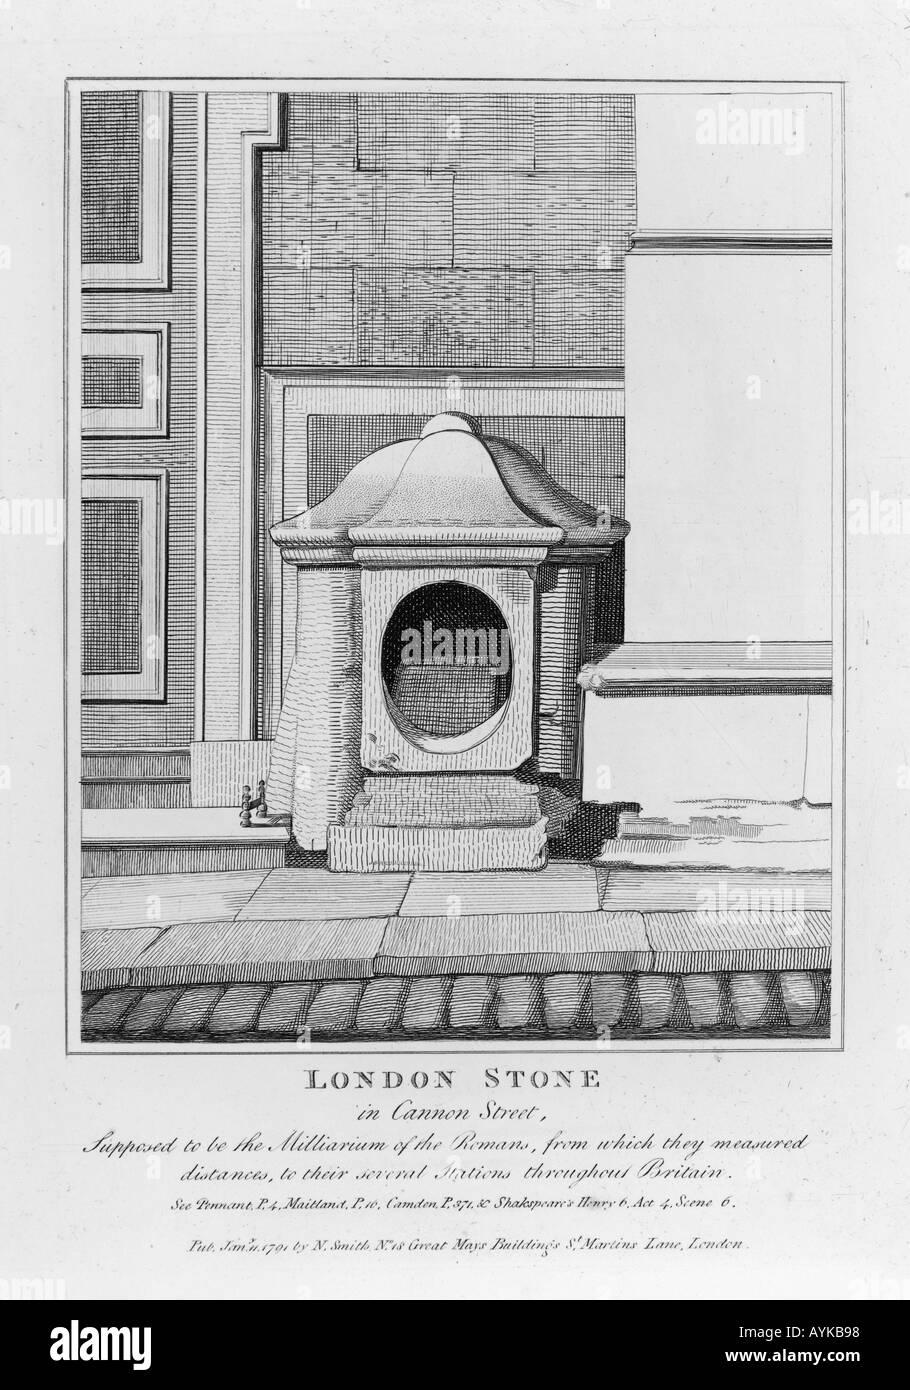 London Stone - Stock Image